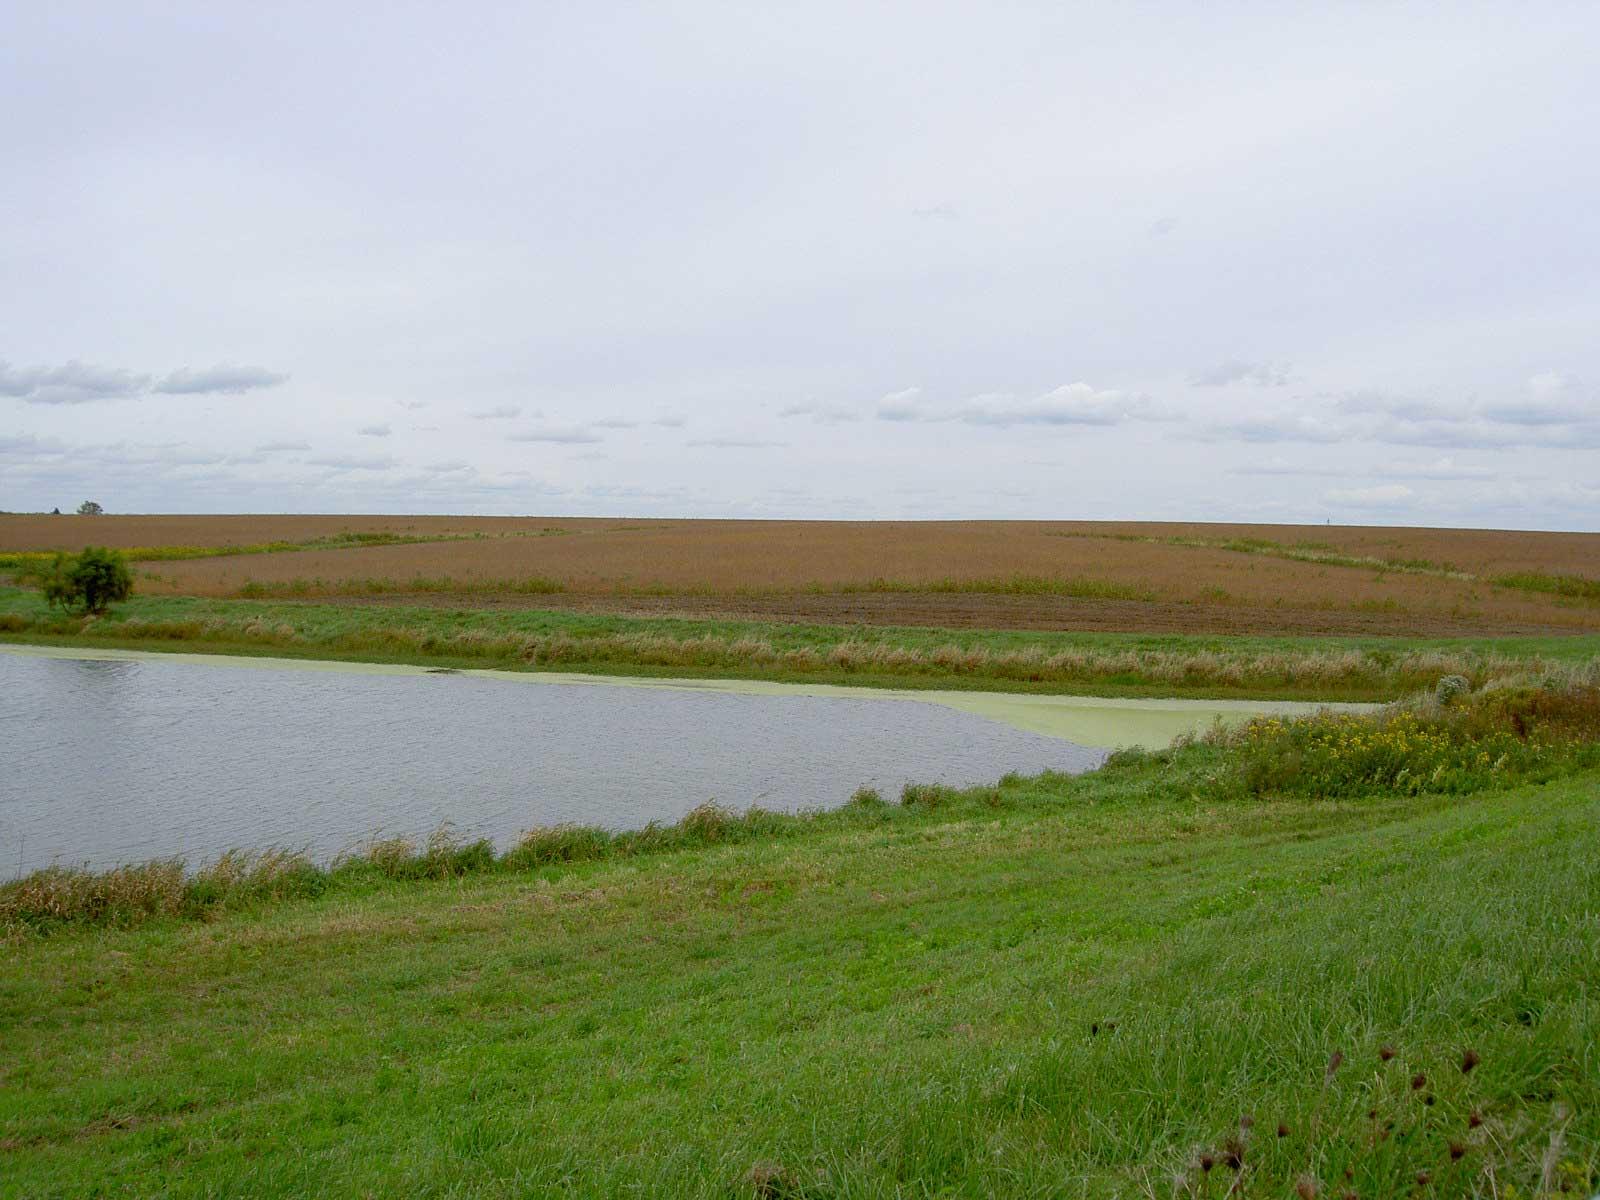 Two miles before Pulaski, Iowa